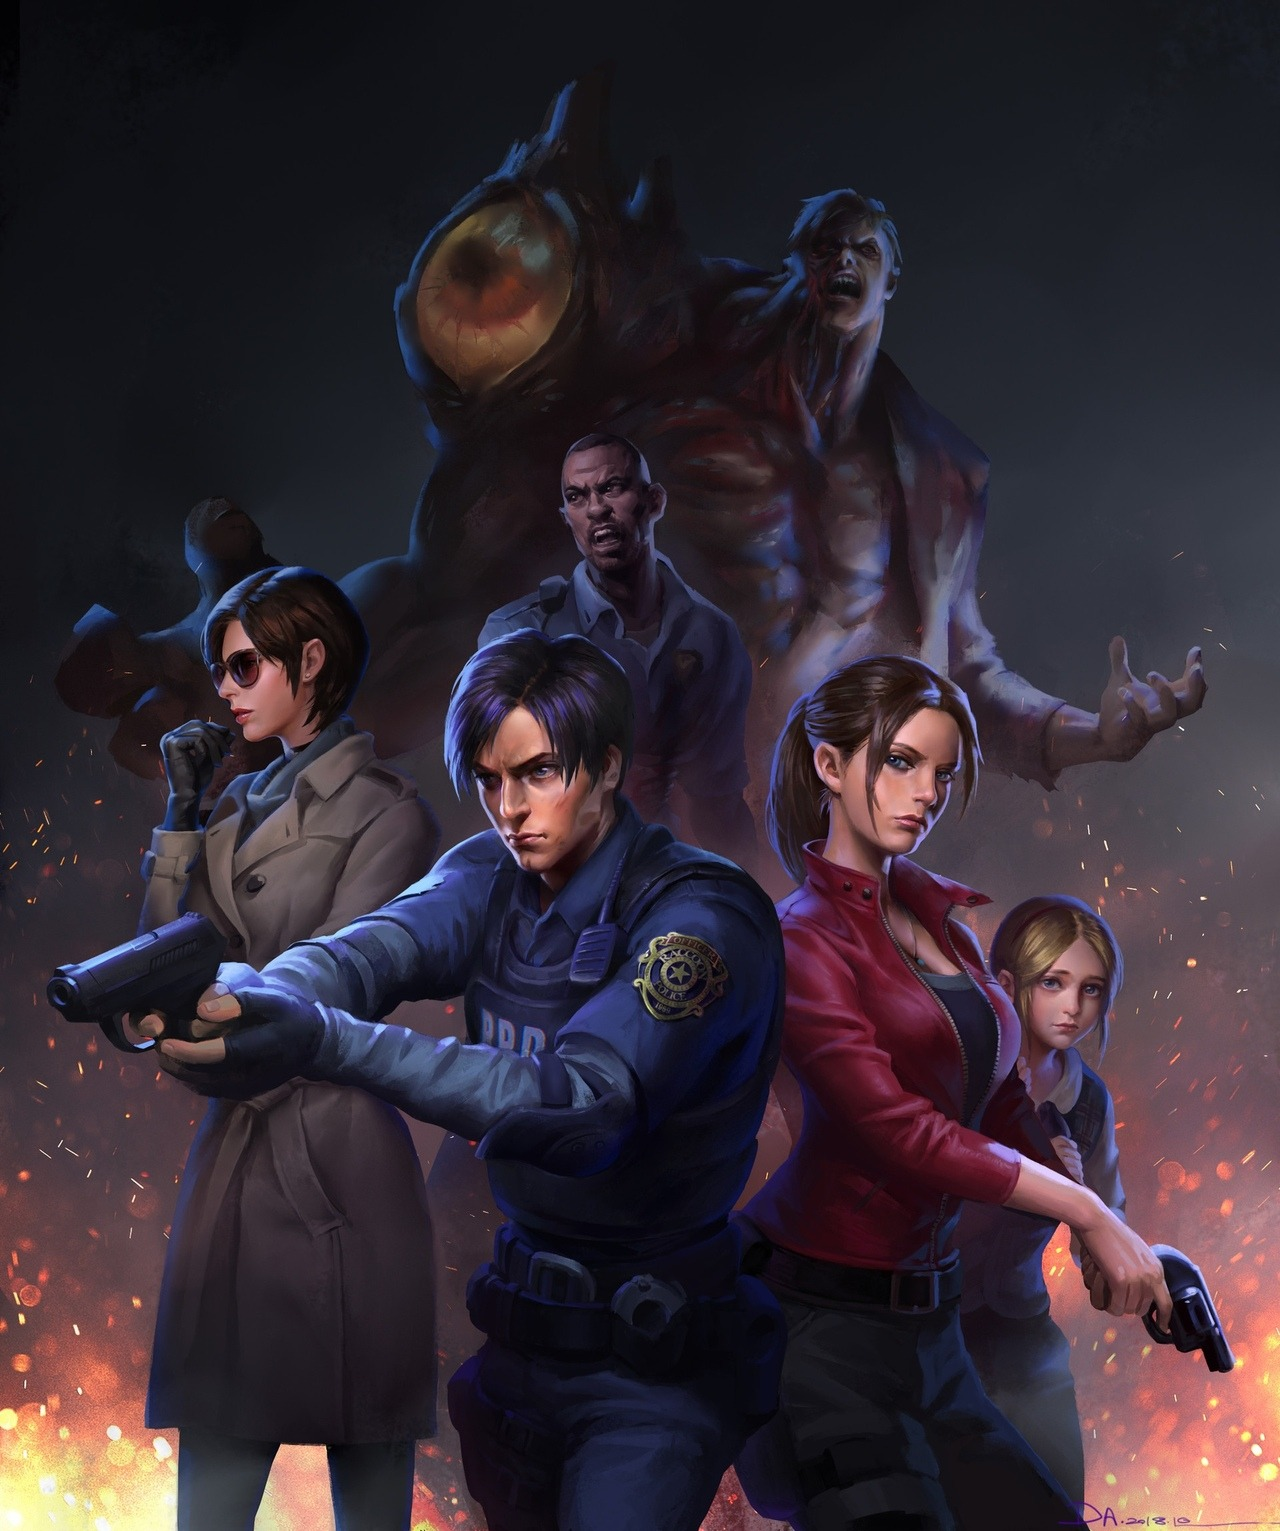 tumblr_phfbxzflTi1xr8an0o1_1280.jpg - Resident Evil 2 Ада Вонг, Клэр Редфилд, Леон С. Кеннеди